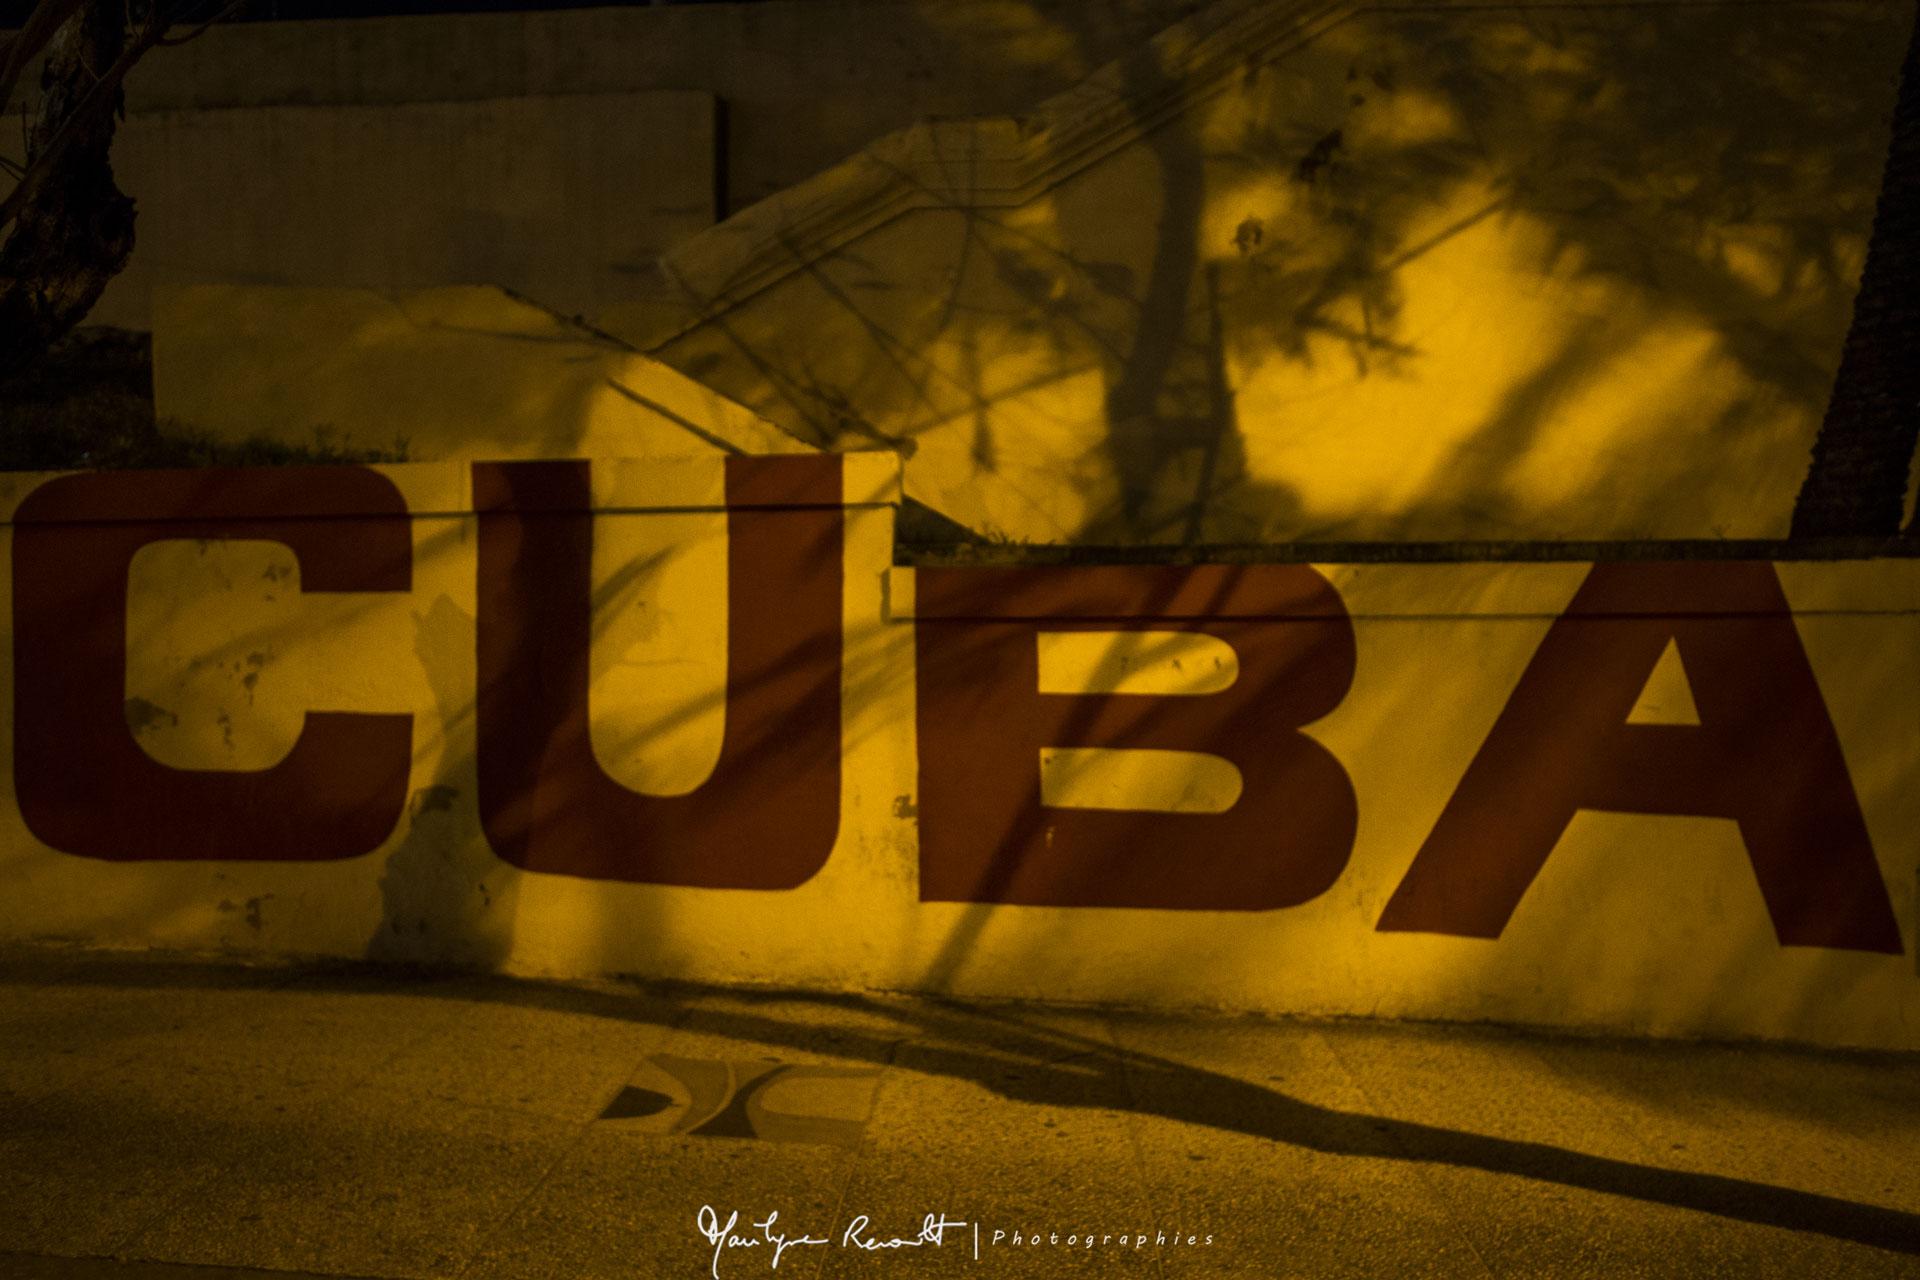 12-Cuba-marilyne renoult